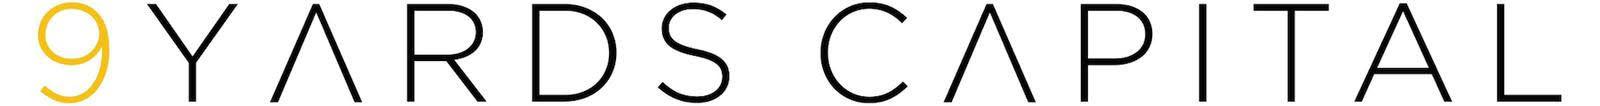 9yards logo website